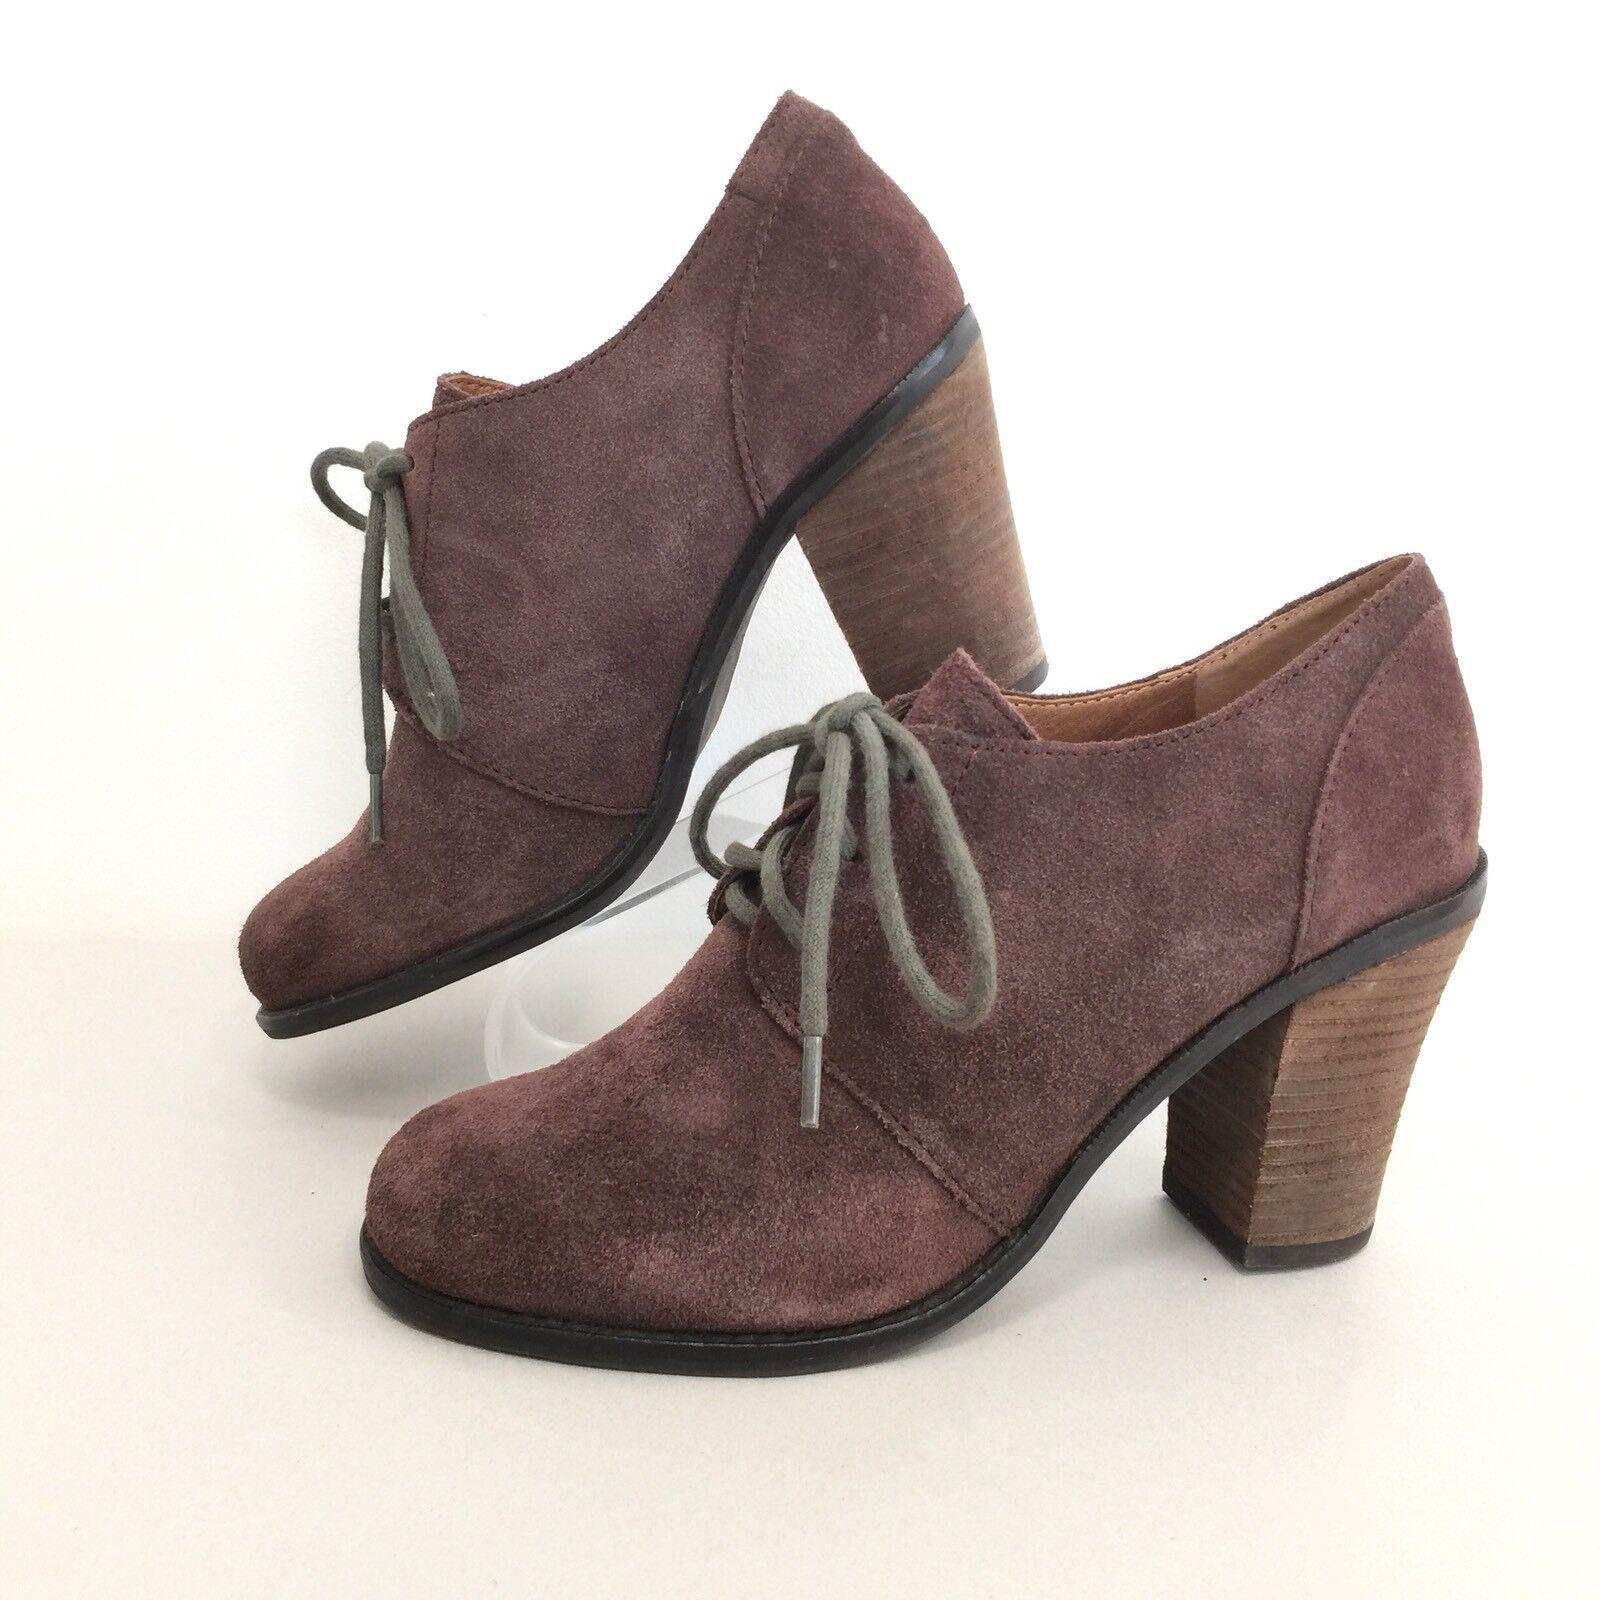 Lucky Brand Womens Sz 8M Mystique Brown Leather Lace Up Bootie shoes 8M EUR 38